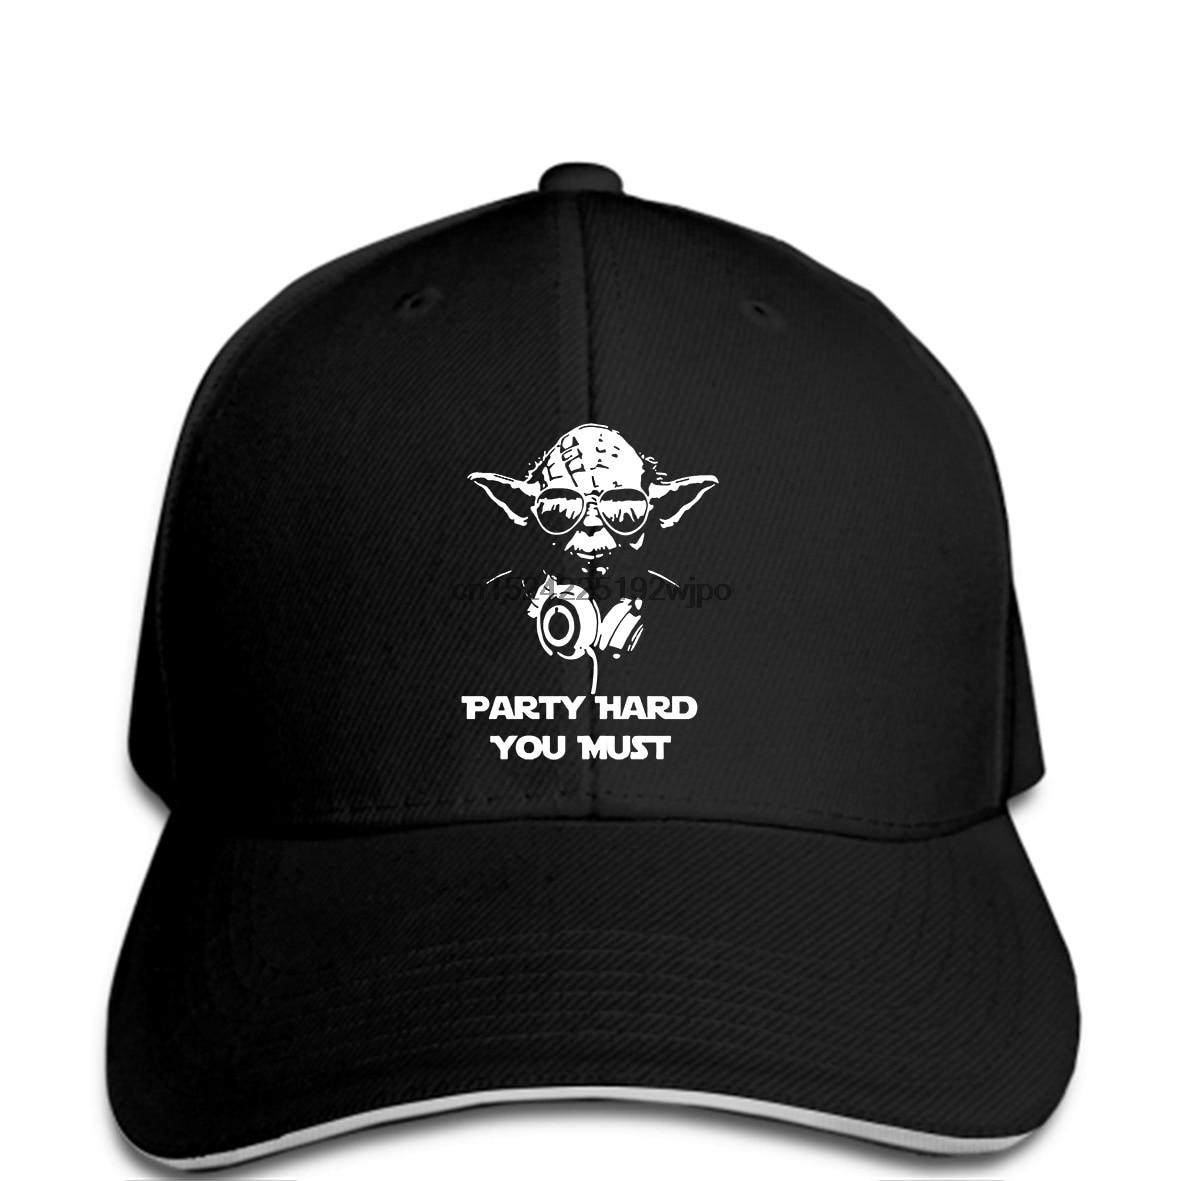 Divertido gorras de béisbol Happwan de moda es DJ Yoda de fiesta debe Jedi SithHumor Premium hombres tapa